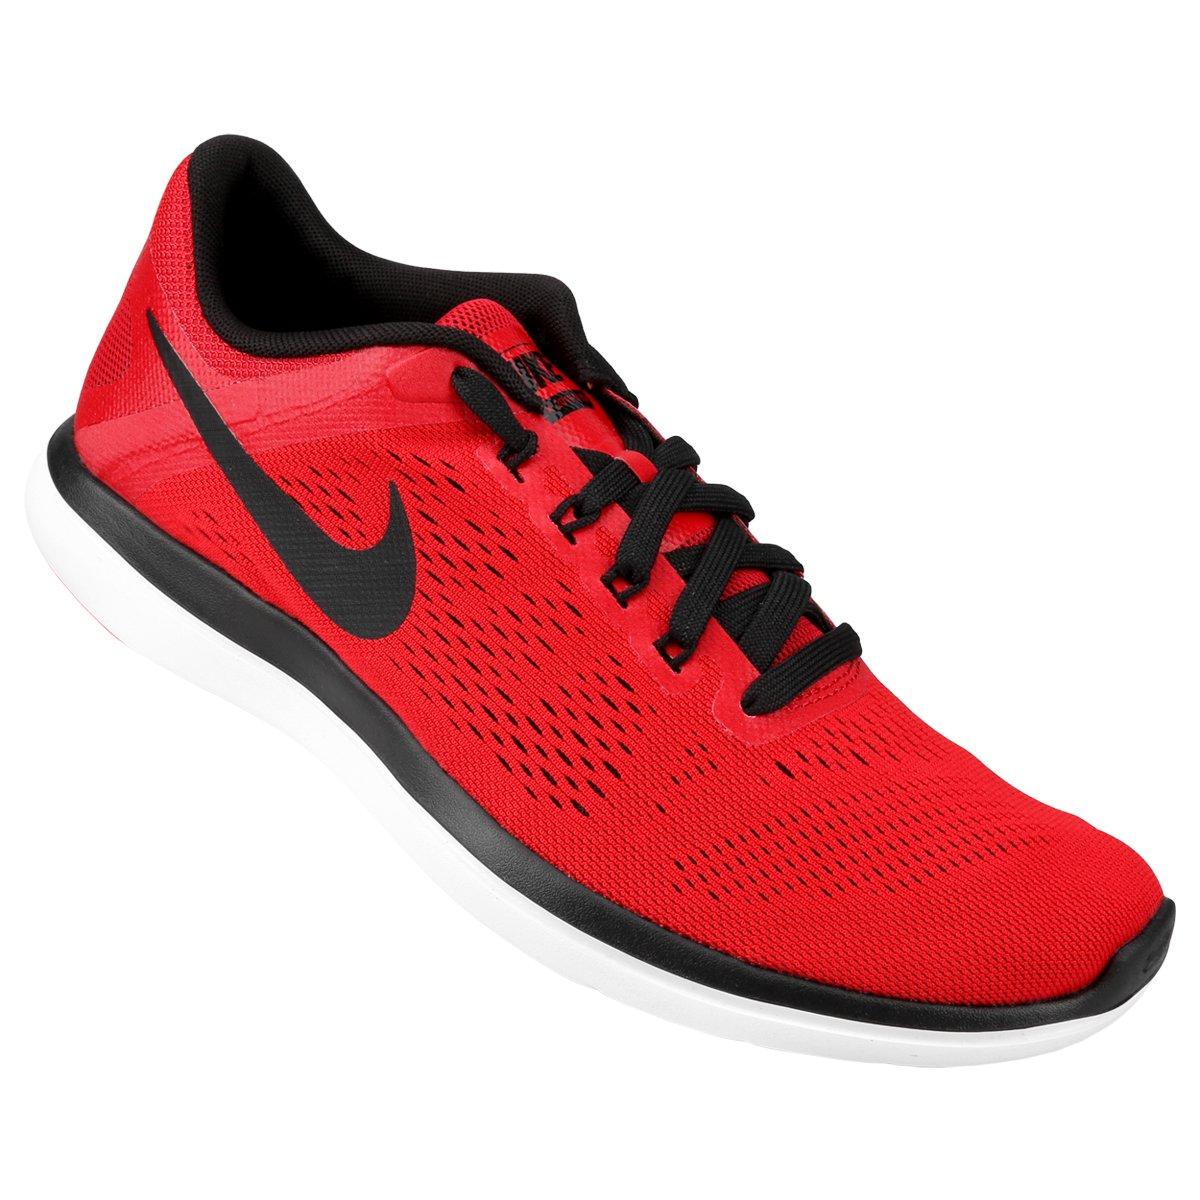 7afc06a8 Tênis Nike Flex 2016 RN Masculino | Shop Timão